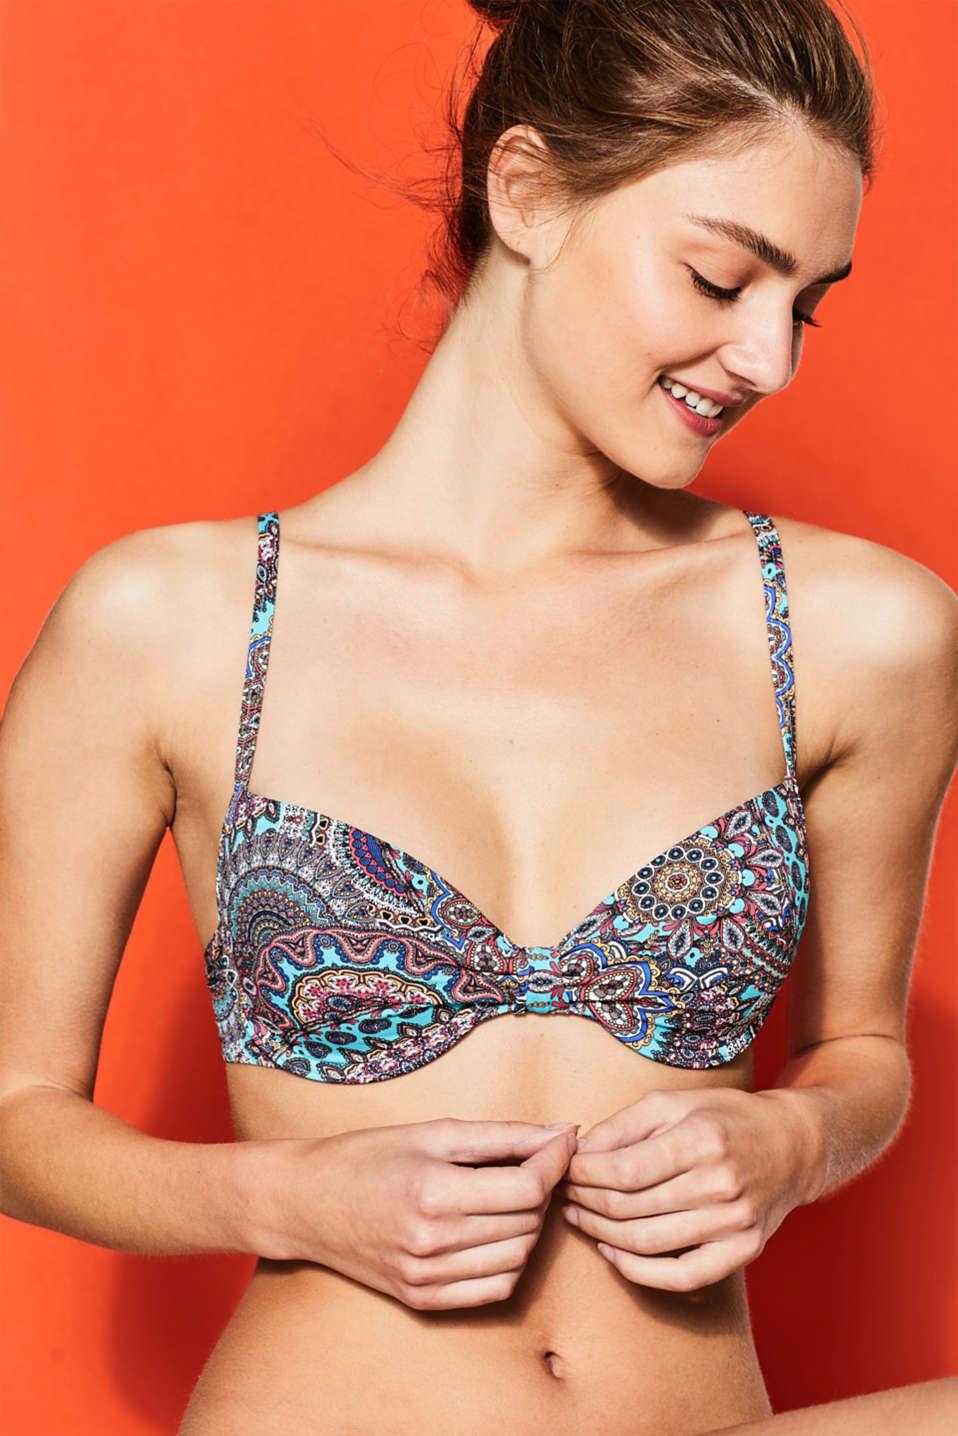 arab nude model